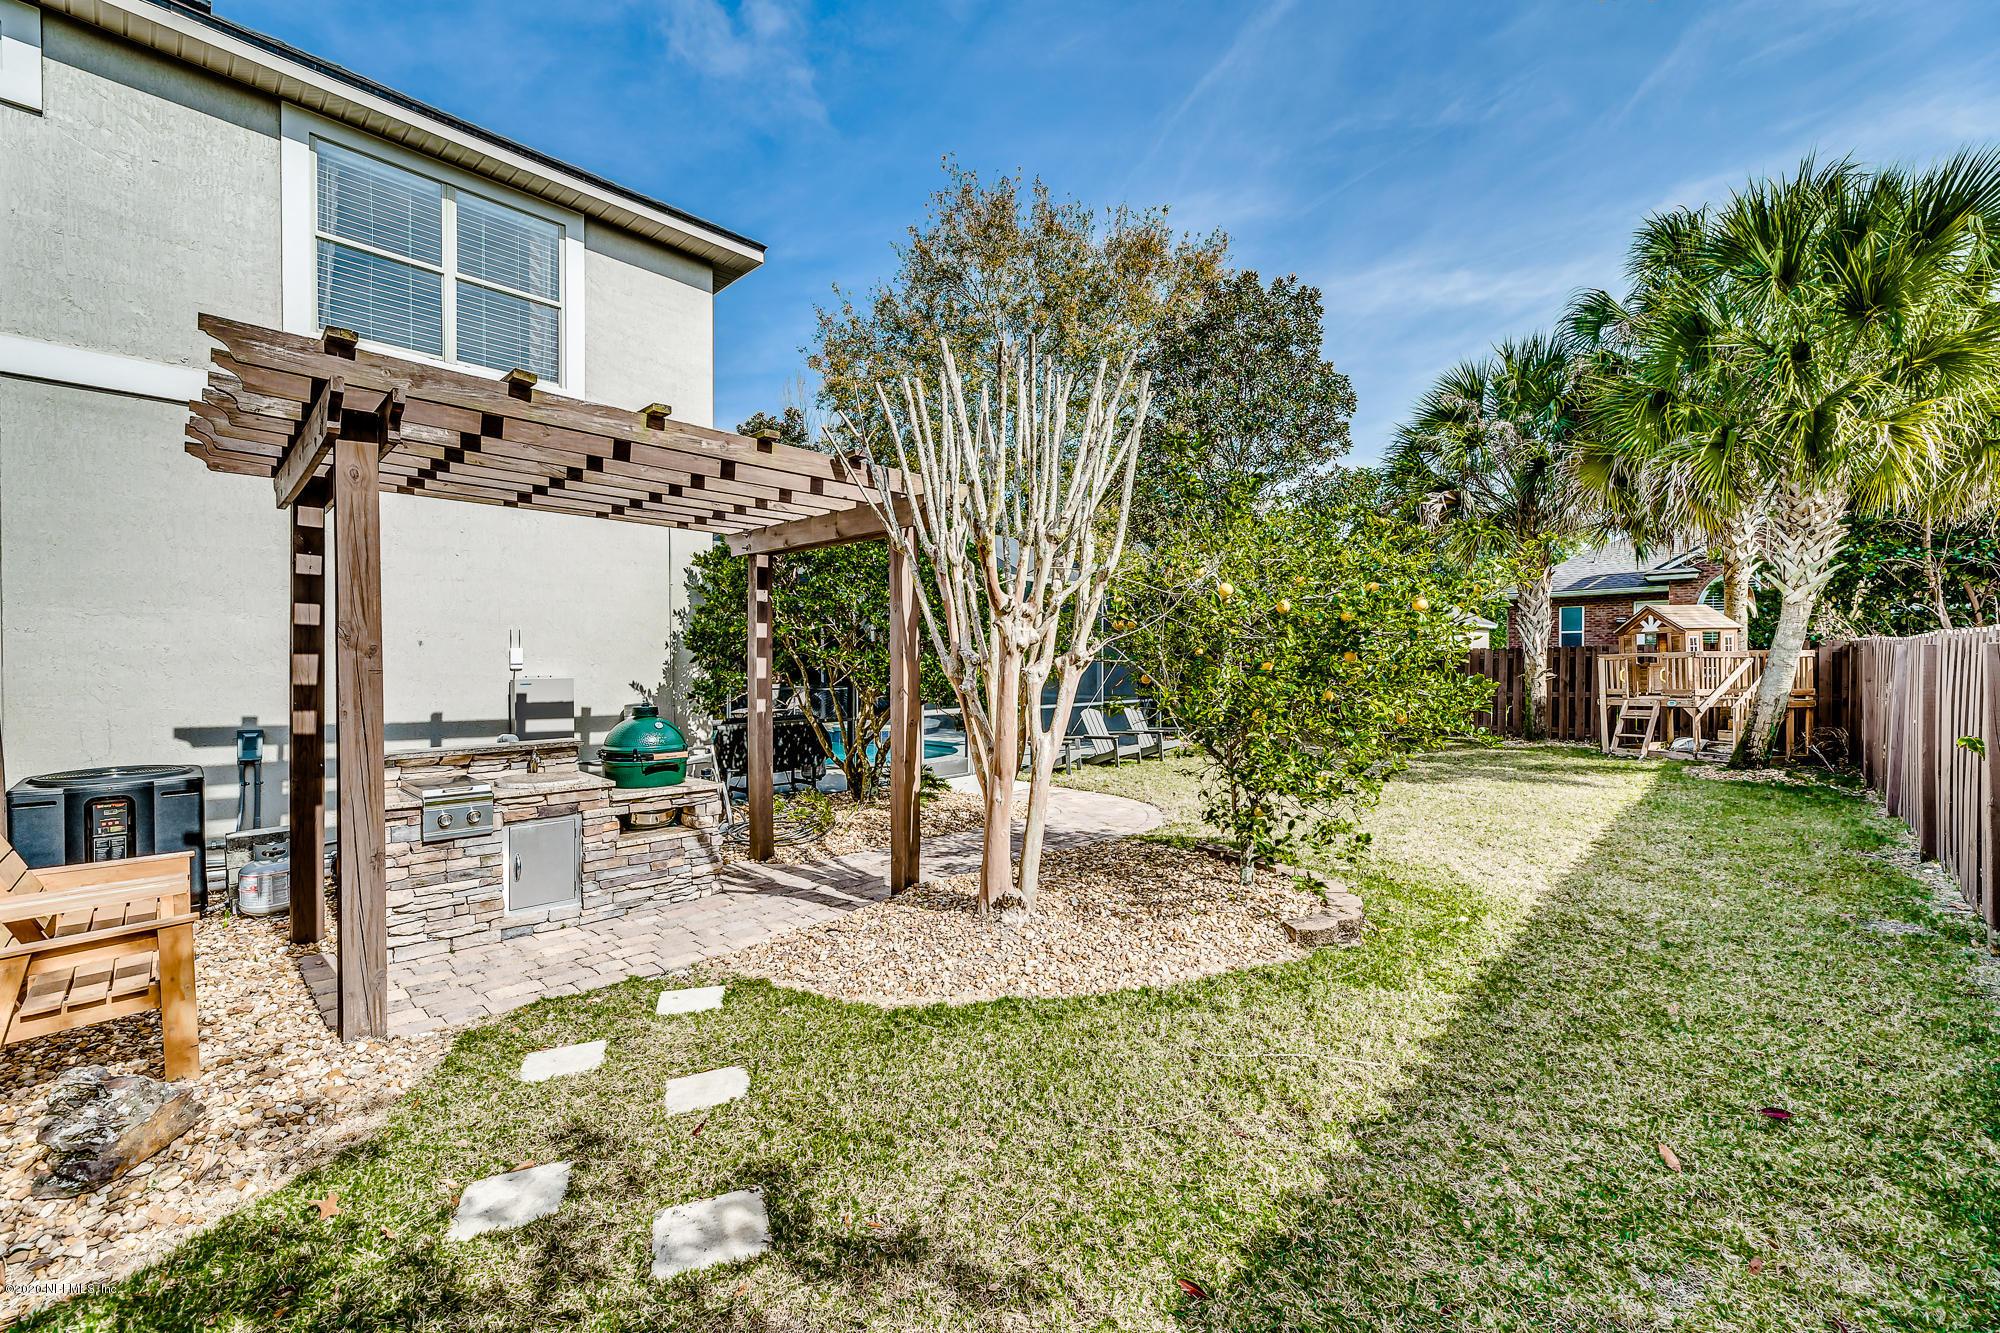 7931 MONTEREY BAY, JACKSONVILLE, FLORIDA 32256, 4 Bedrooms Bedrooms, ,4 BathroomsBathrooms,Residential,For sale,MONTEREY BAY,1038358